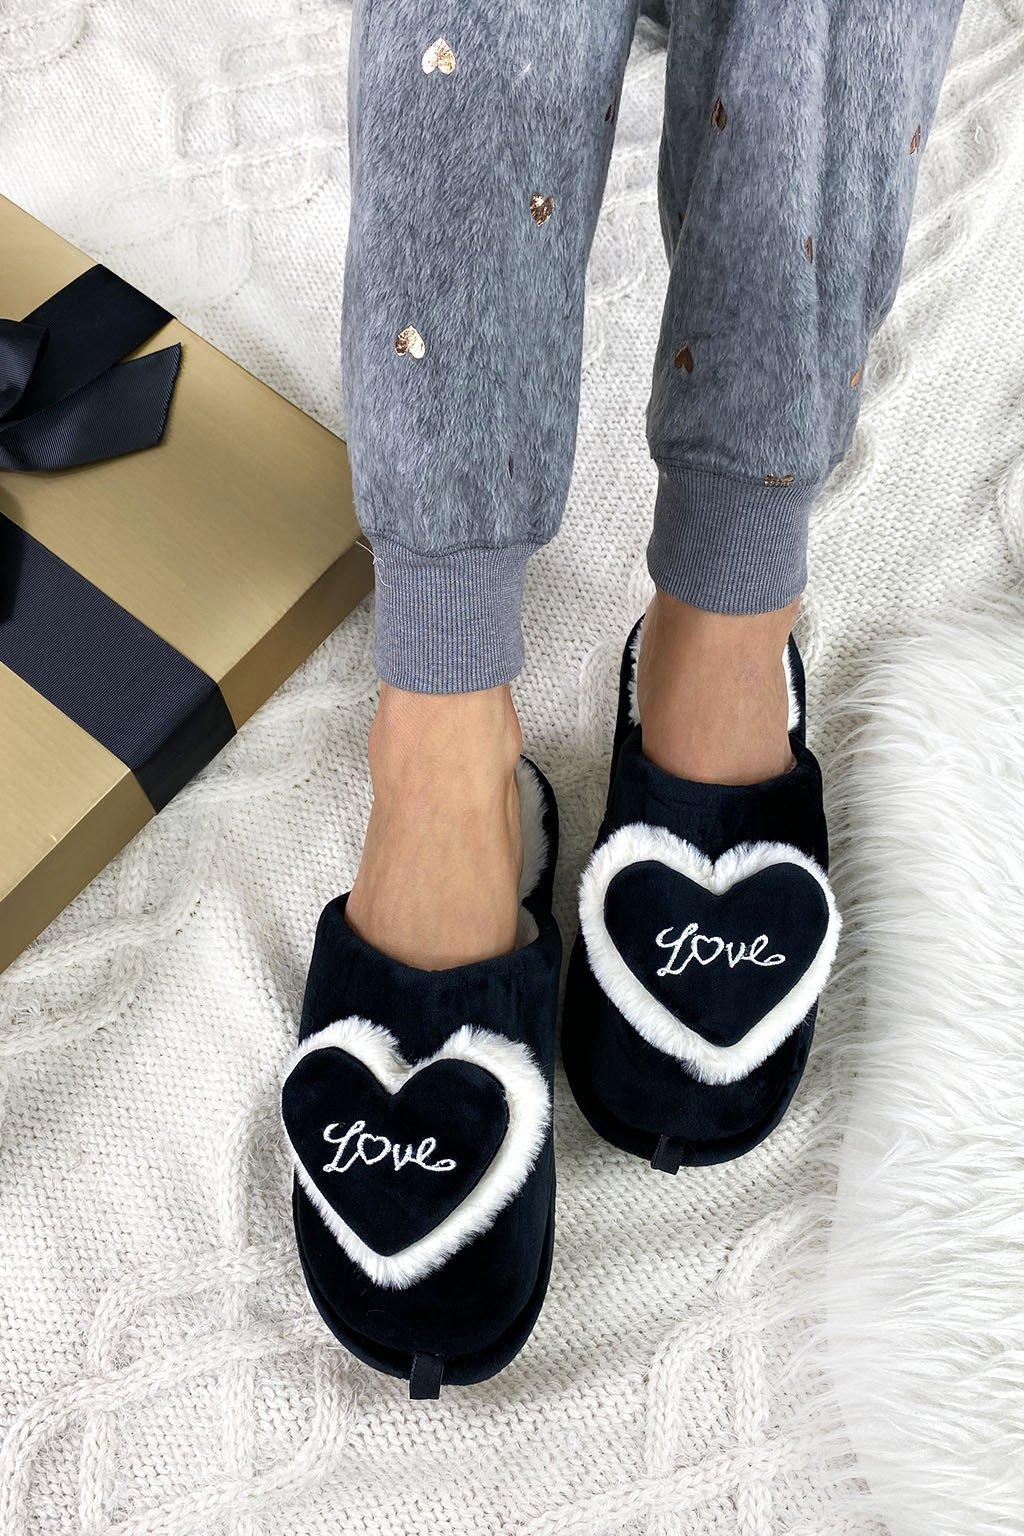 papuce cerne love